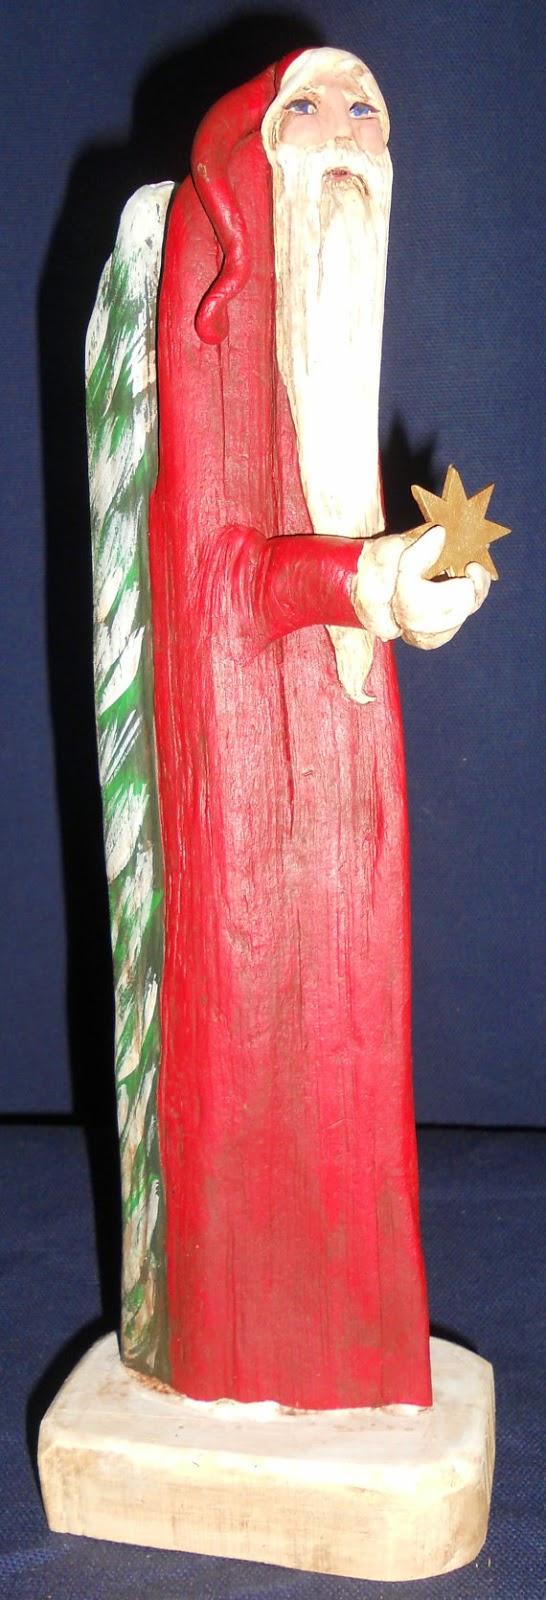 Papa Noel con Madera a la Deriva Pintada, I Parte